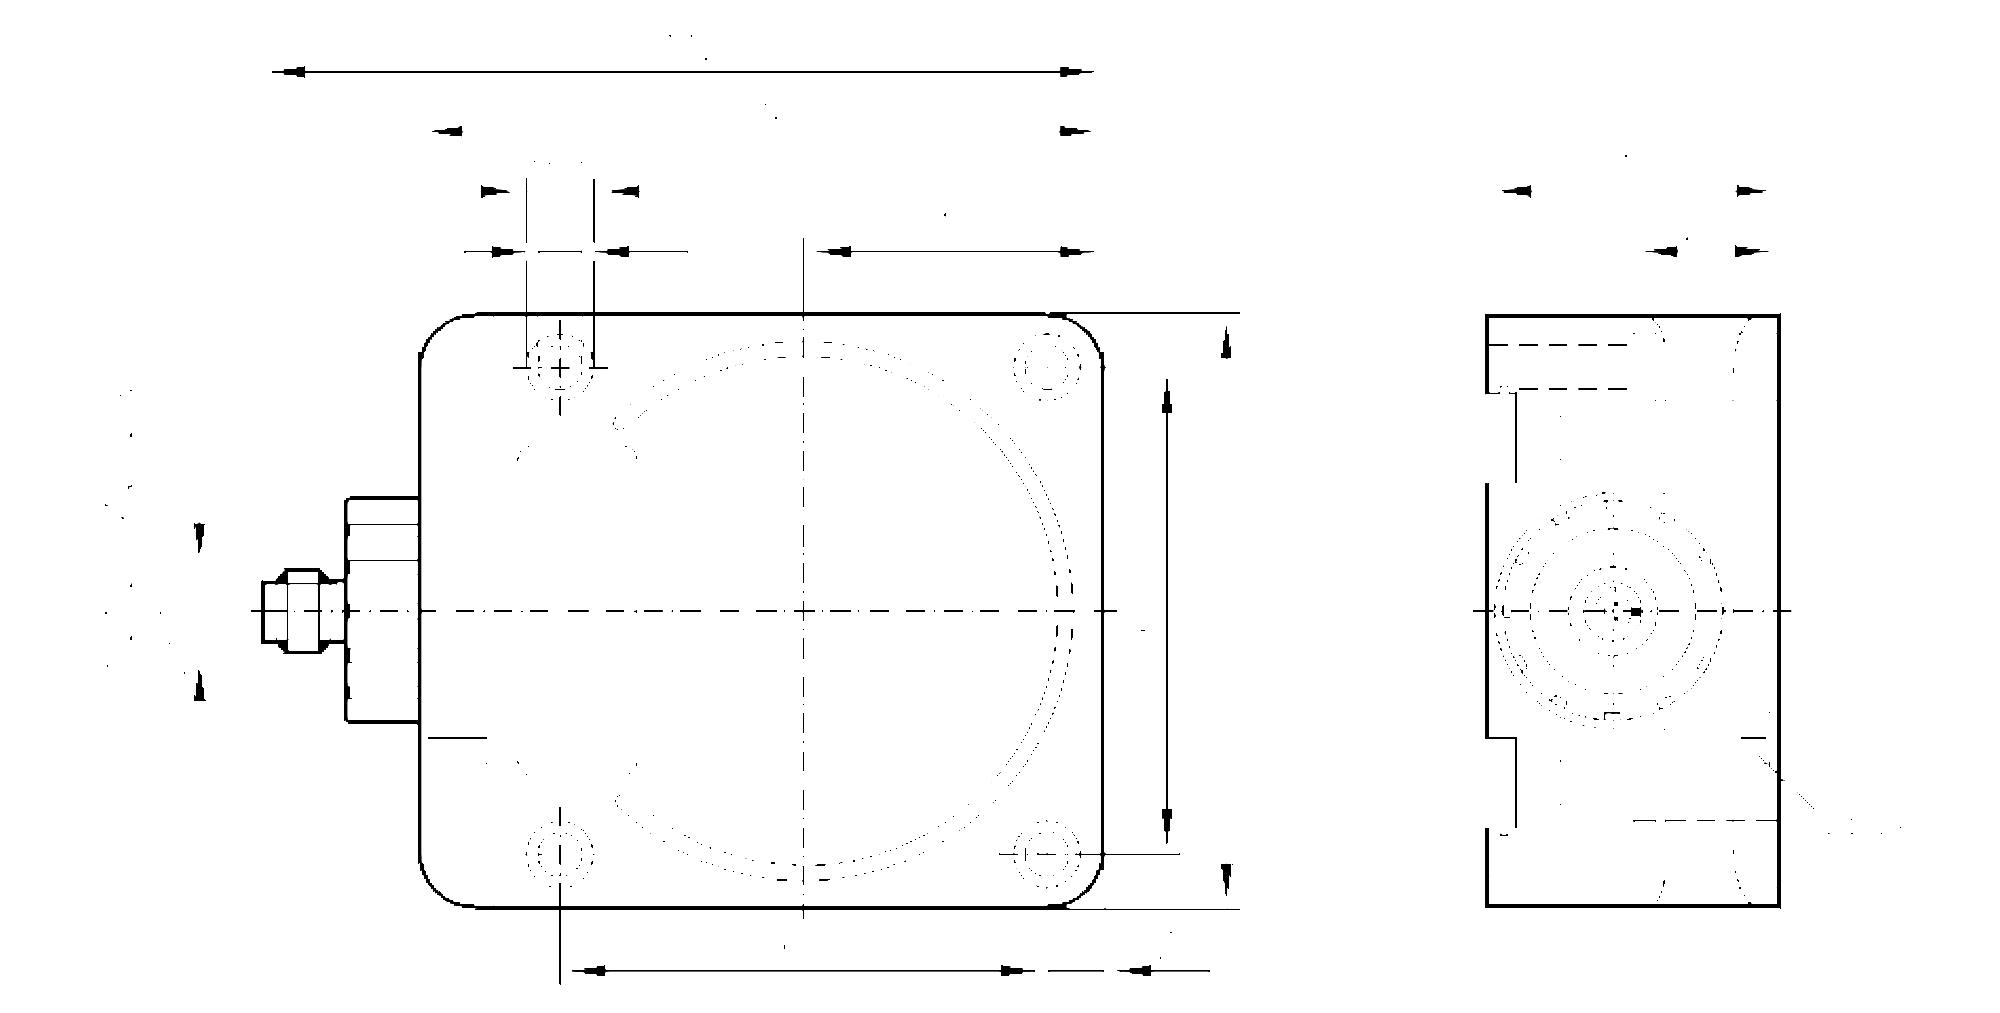 id0039 - inductive sensor